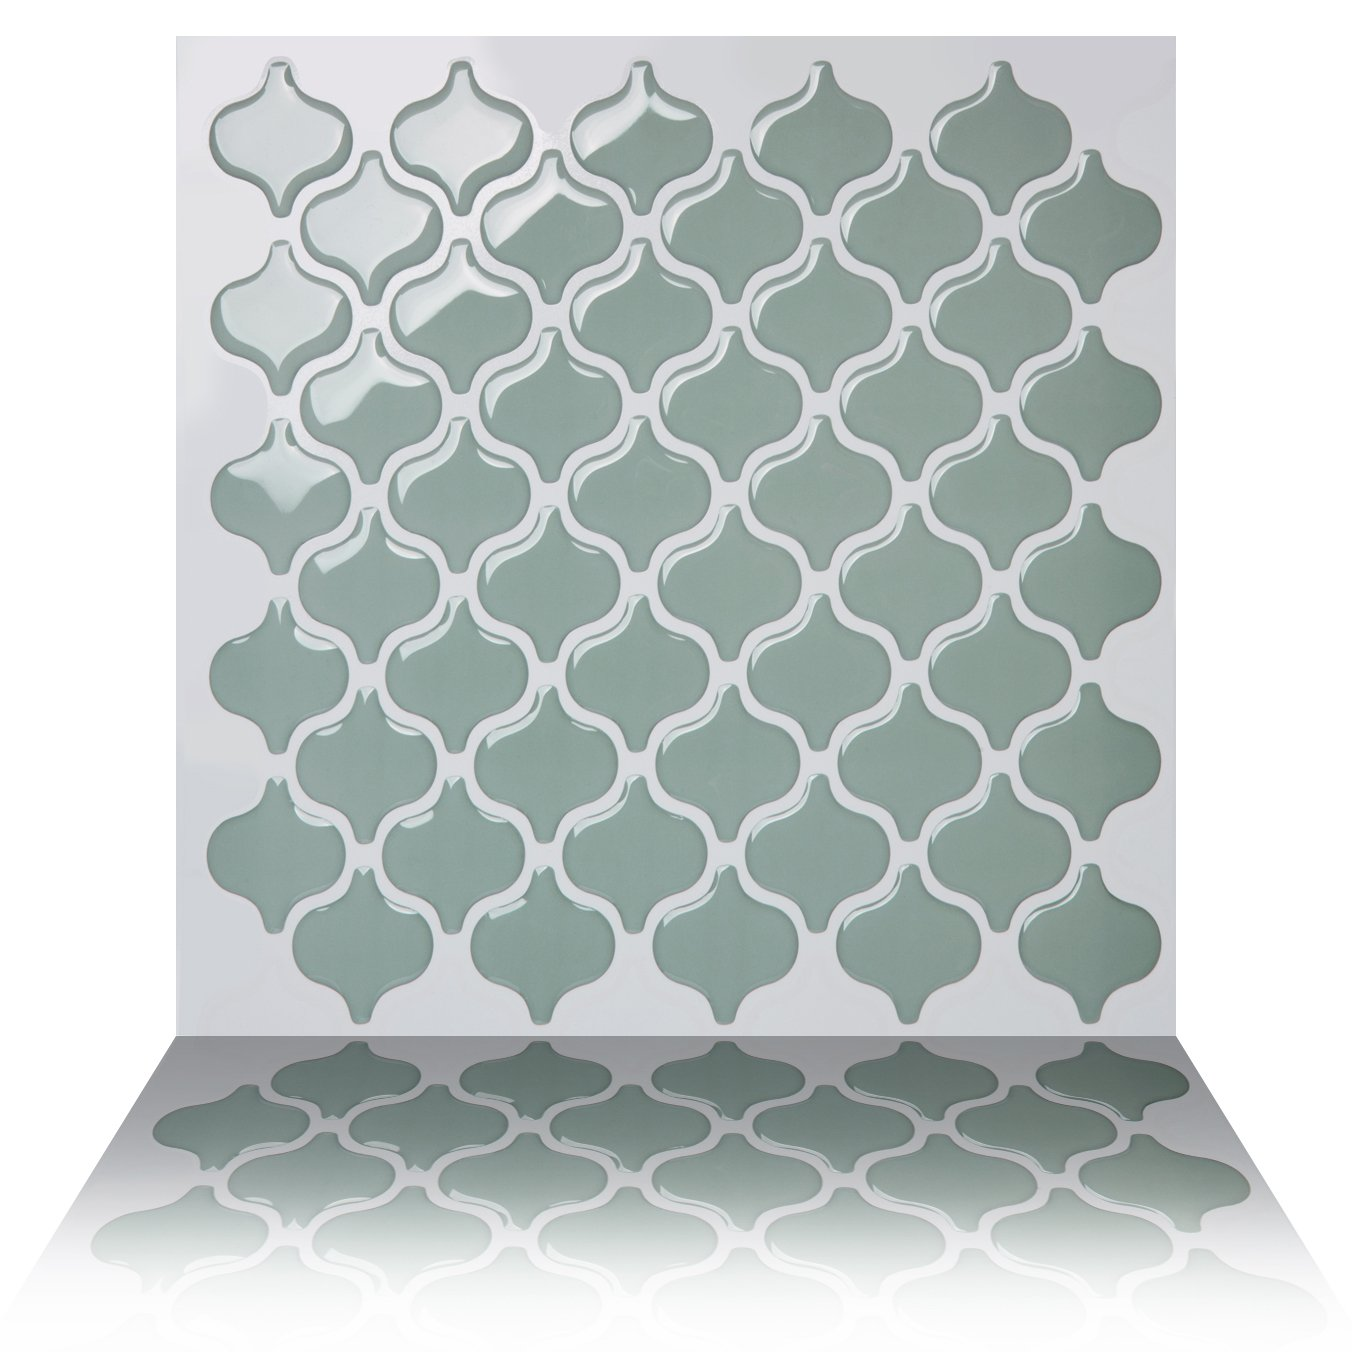 Amazon.com: Tic Tac Tiles Anti-mold Peel Stick Wall Tile in Damask ...